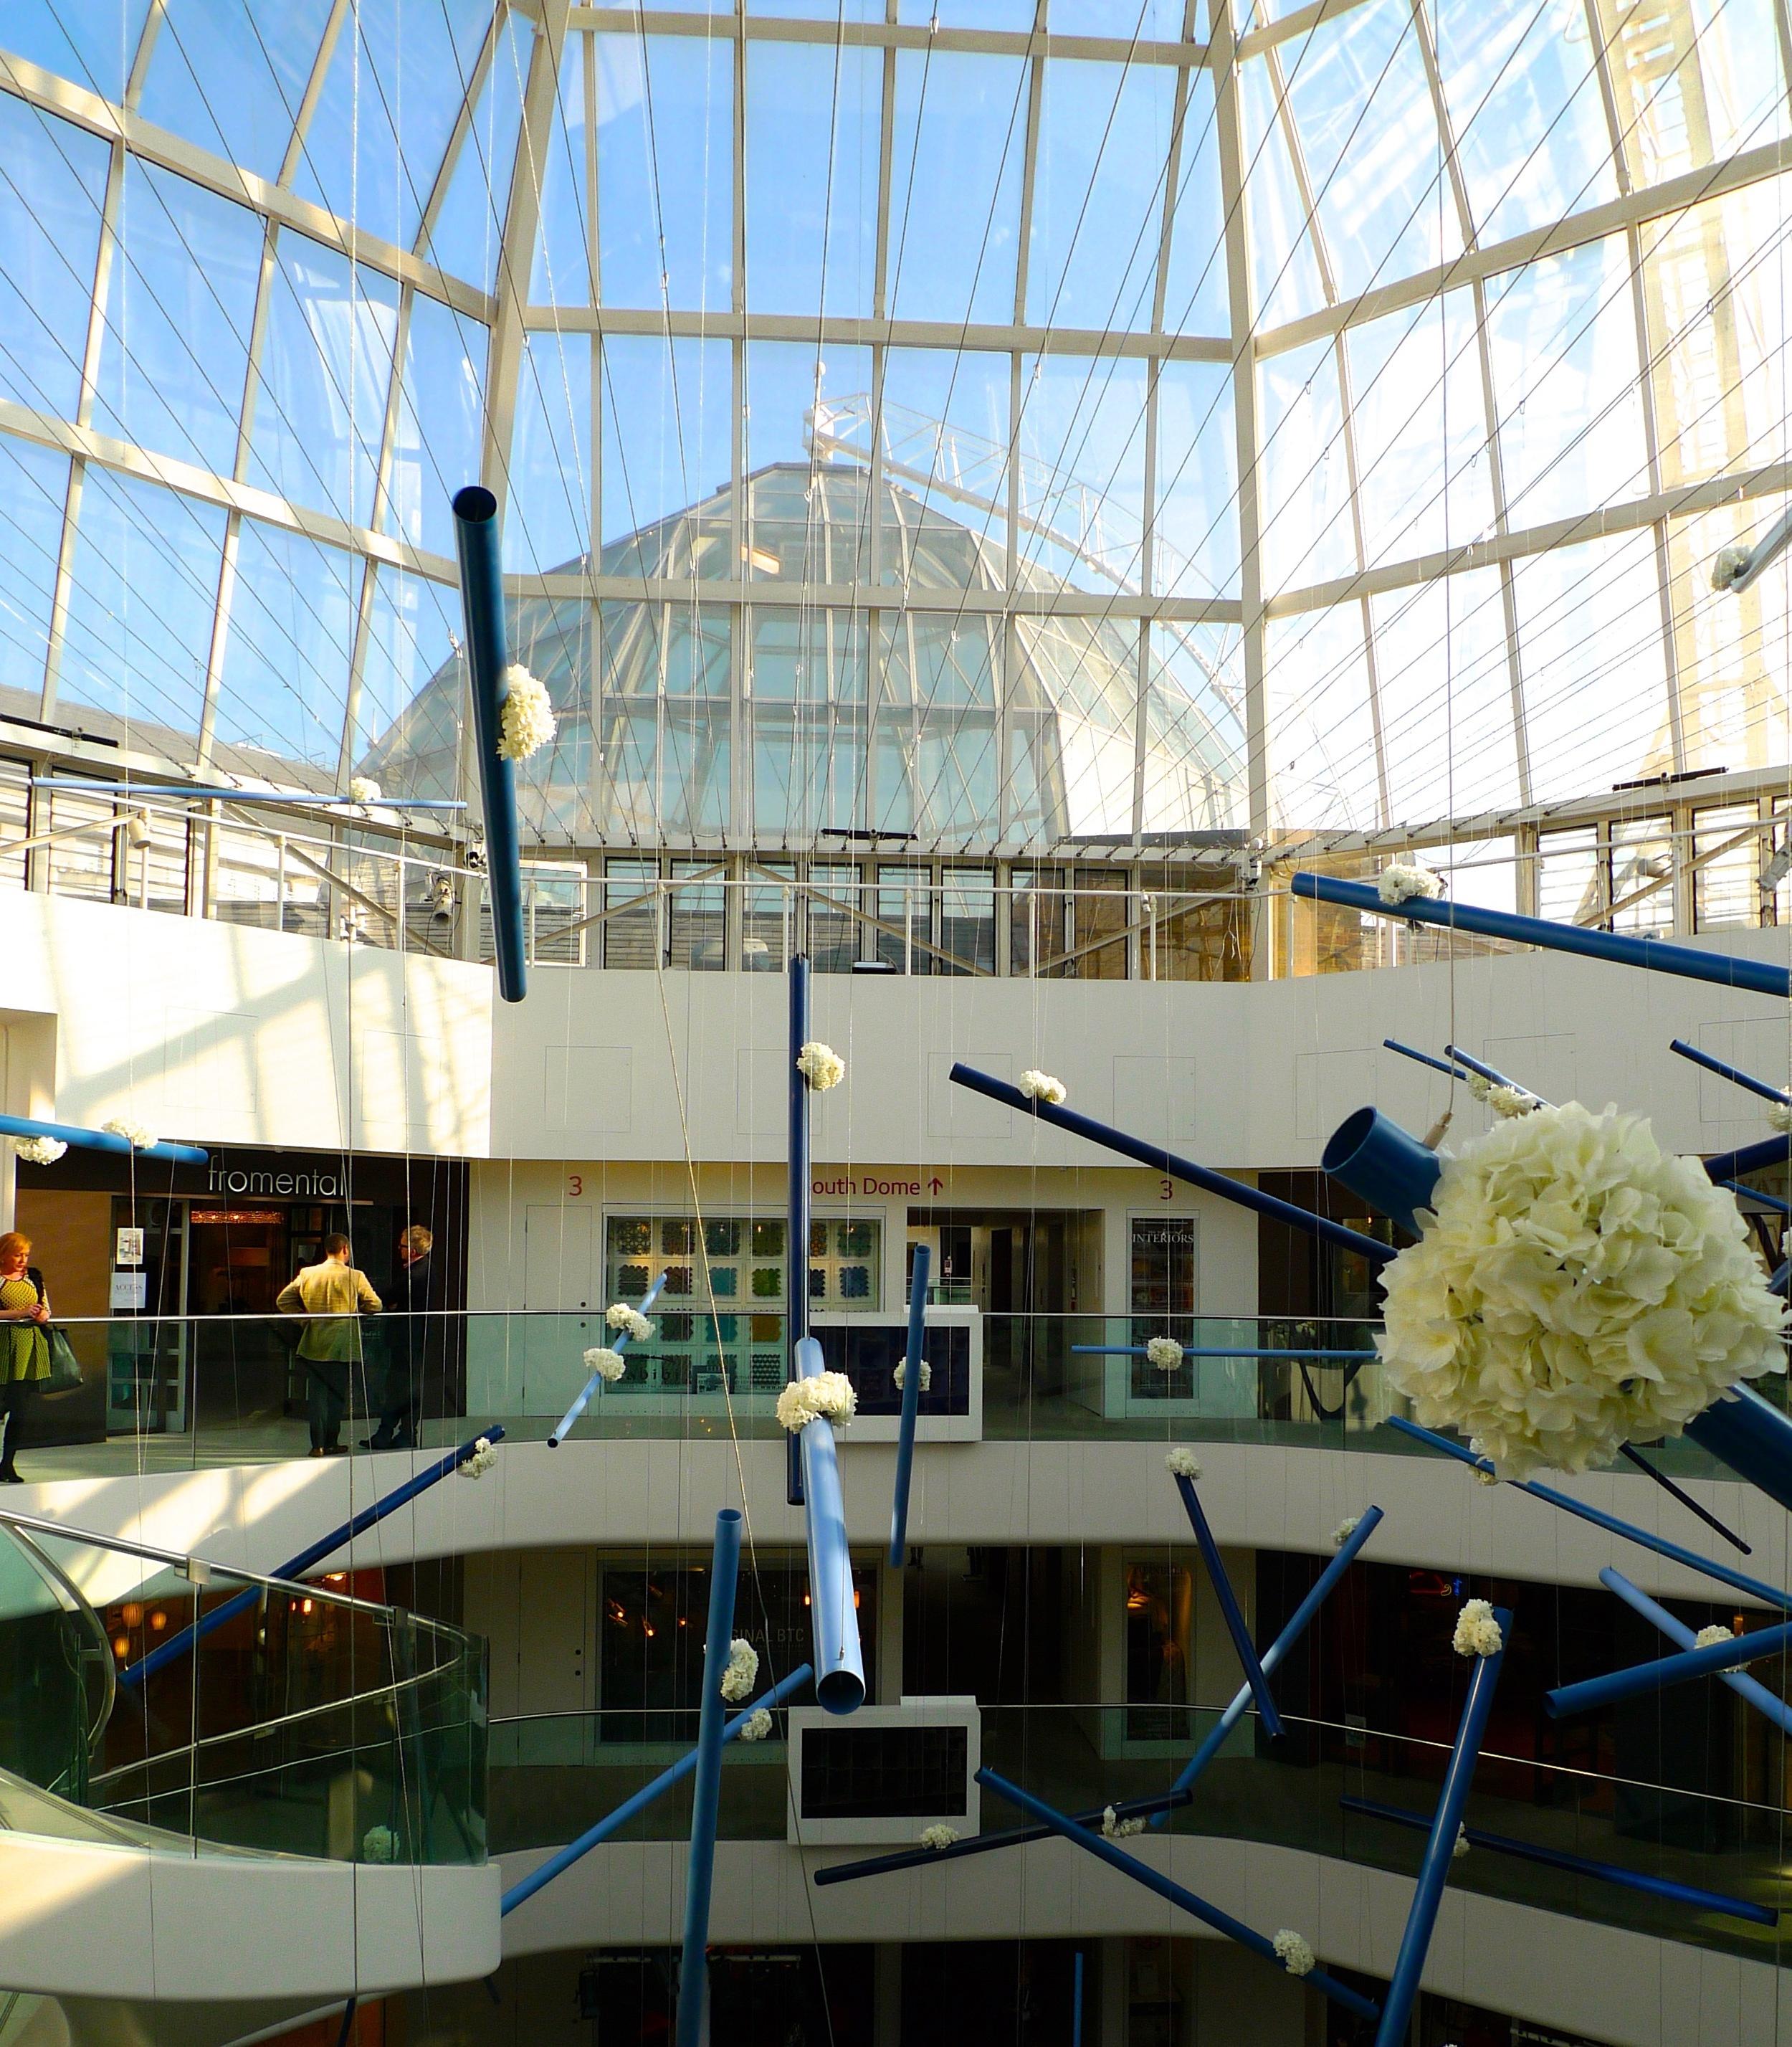 central dome